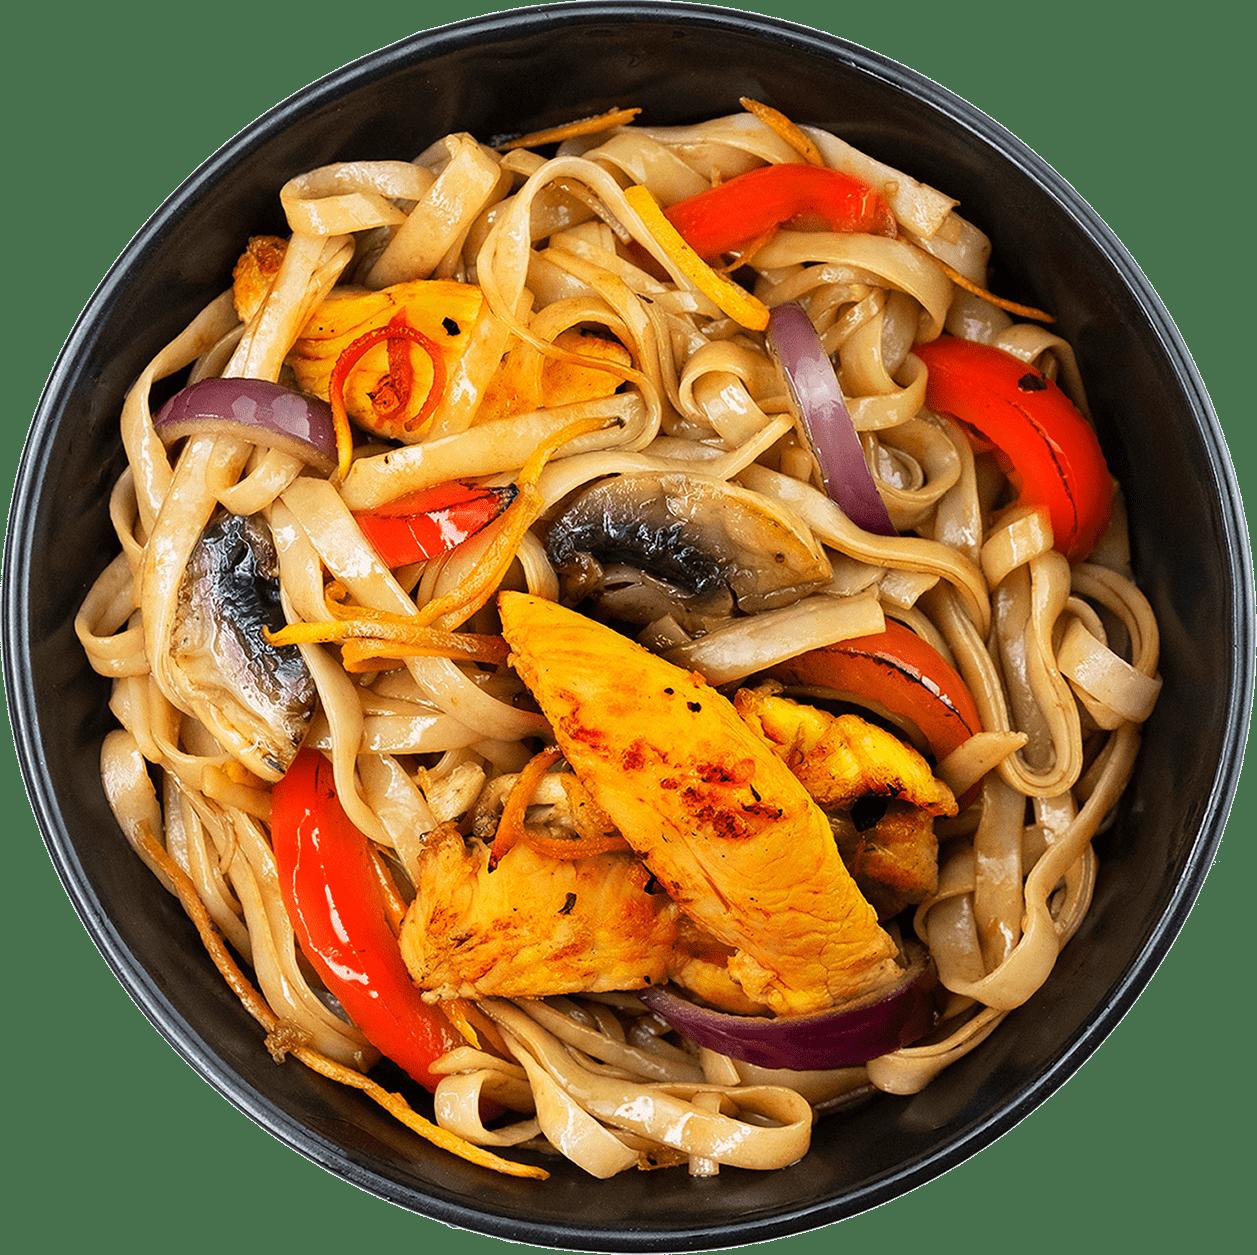 Рецепт рисової локшини з куркою та овочами по-китайськи